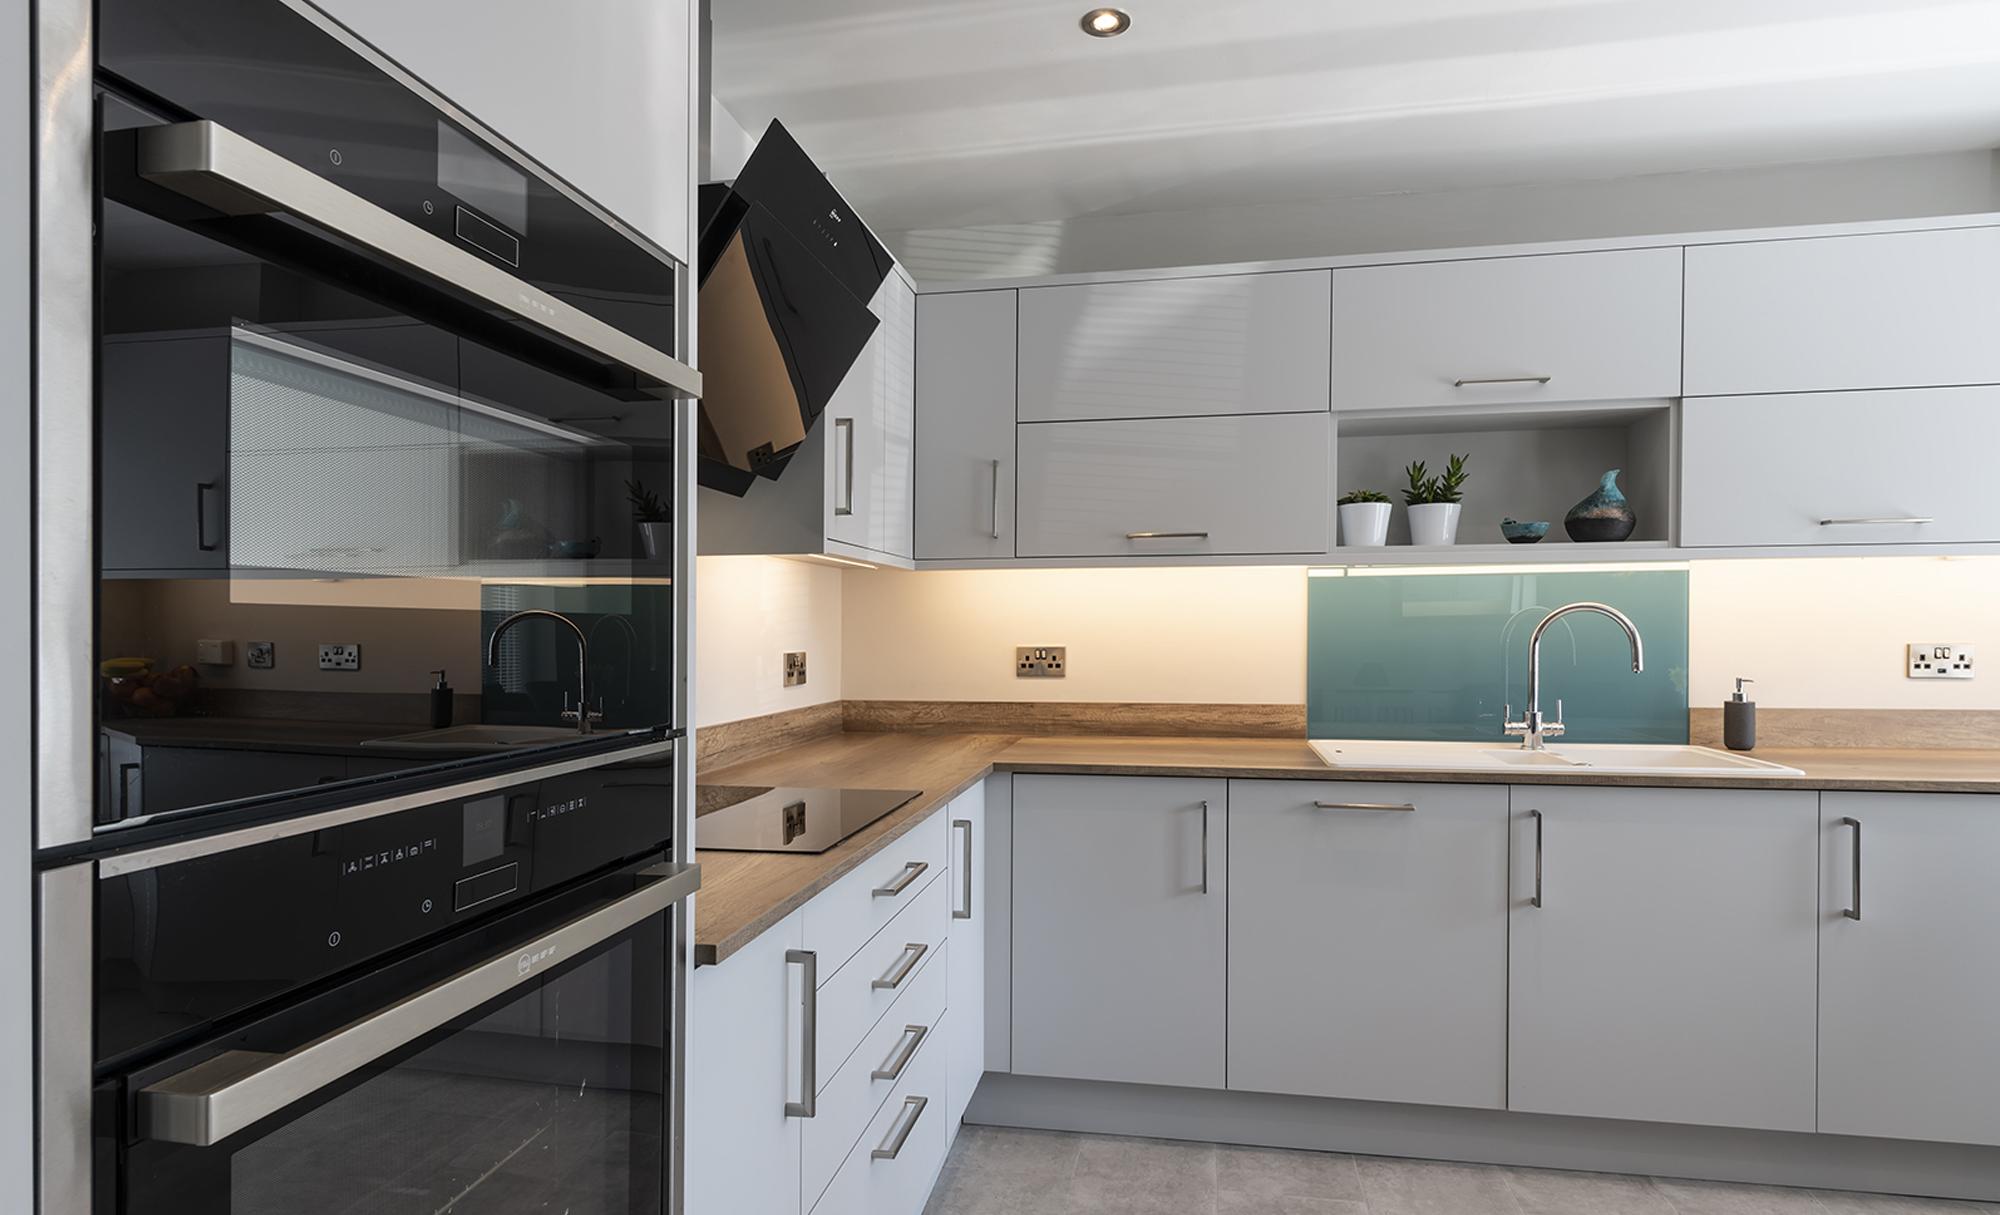 Portishead Kitchens Zola Matte Light Grey Kitchen for Mr & Mrs McElroy, Marina, Portishead